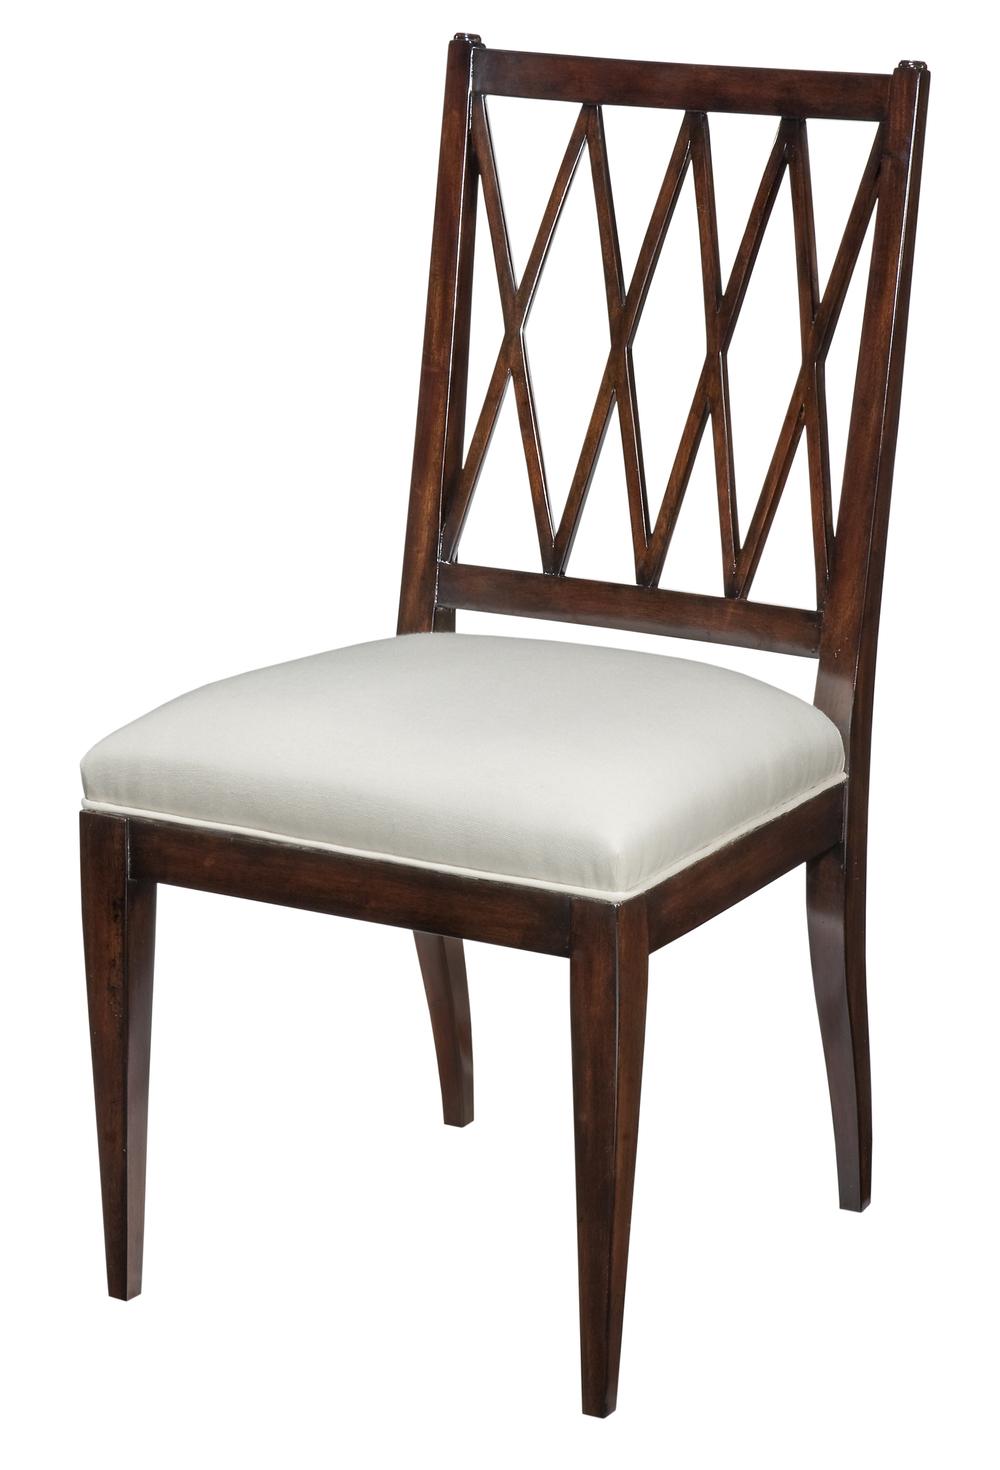 Woodbridge Furniture Company - Addison Side Chair